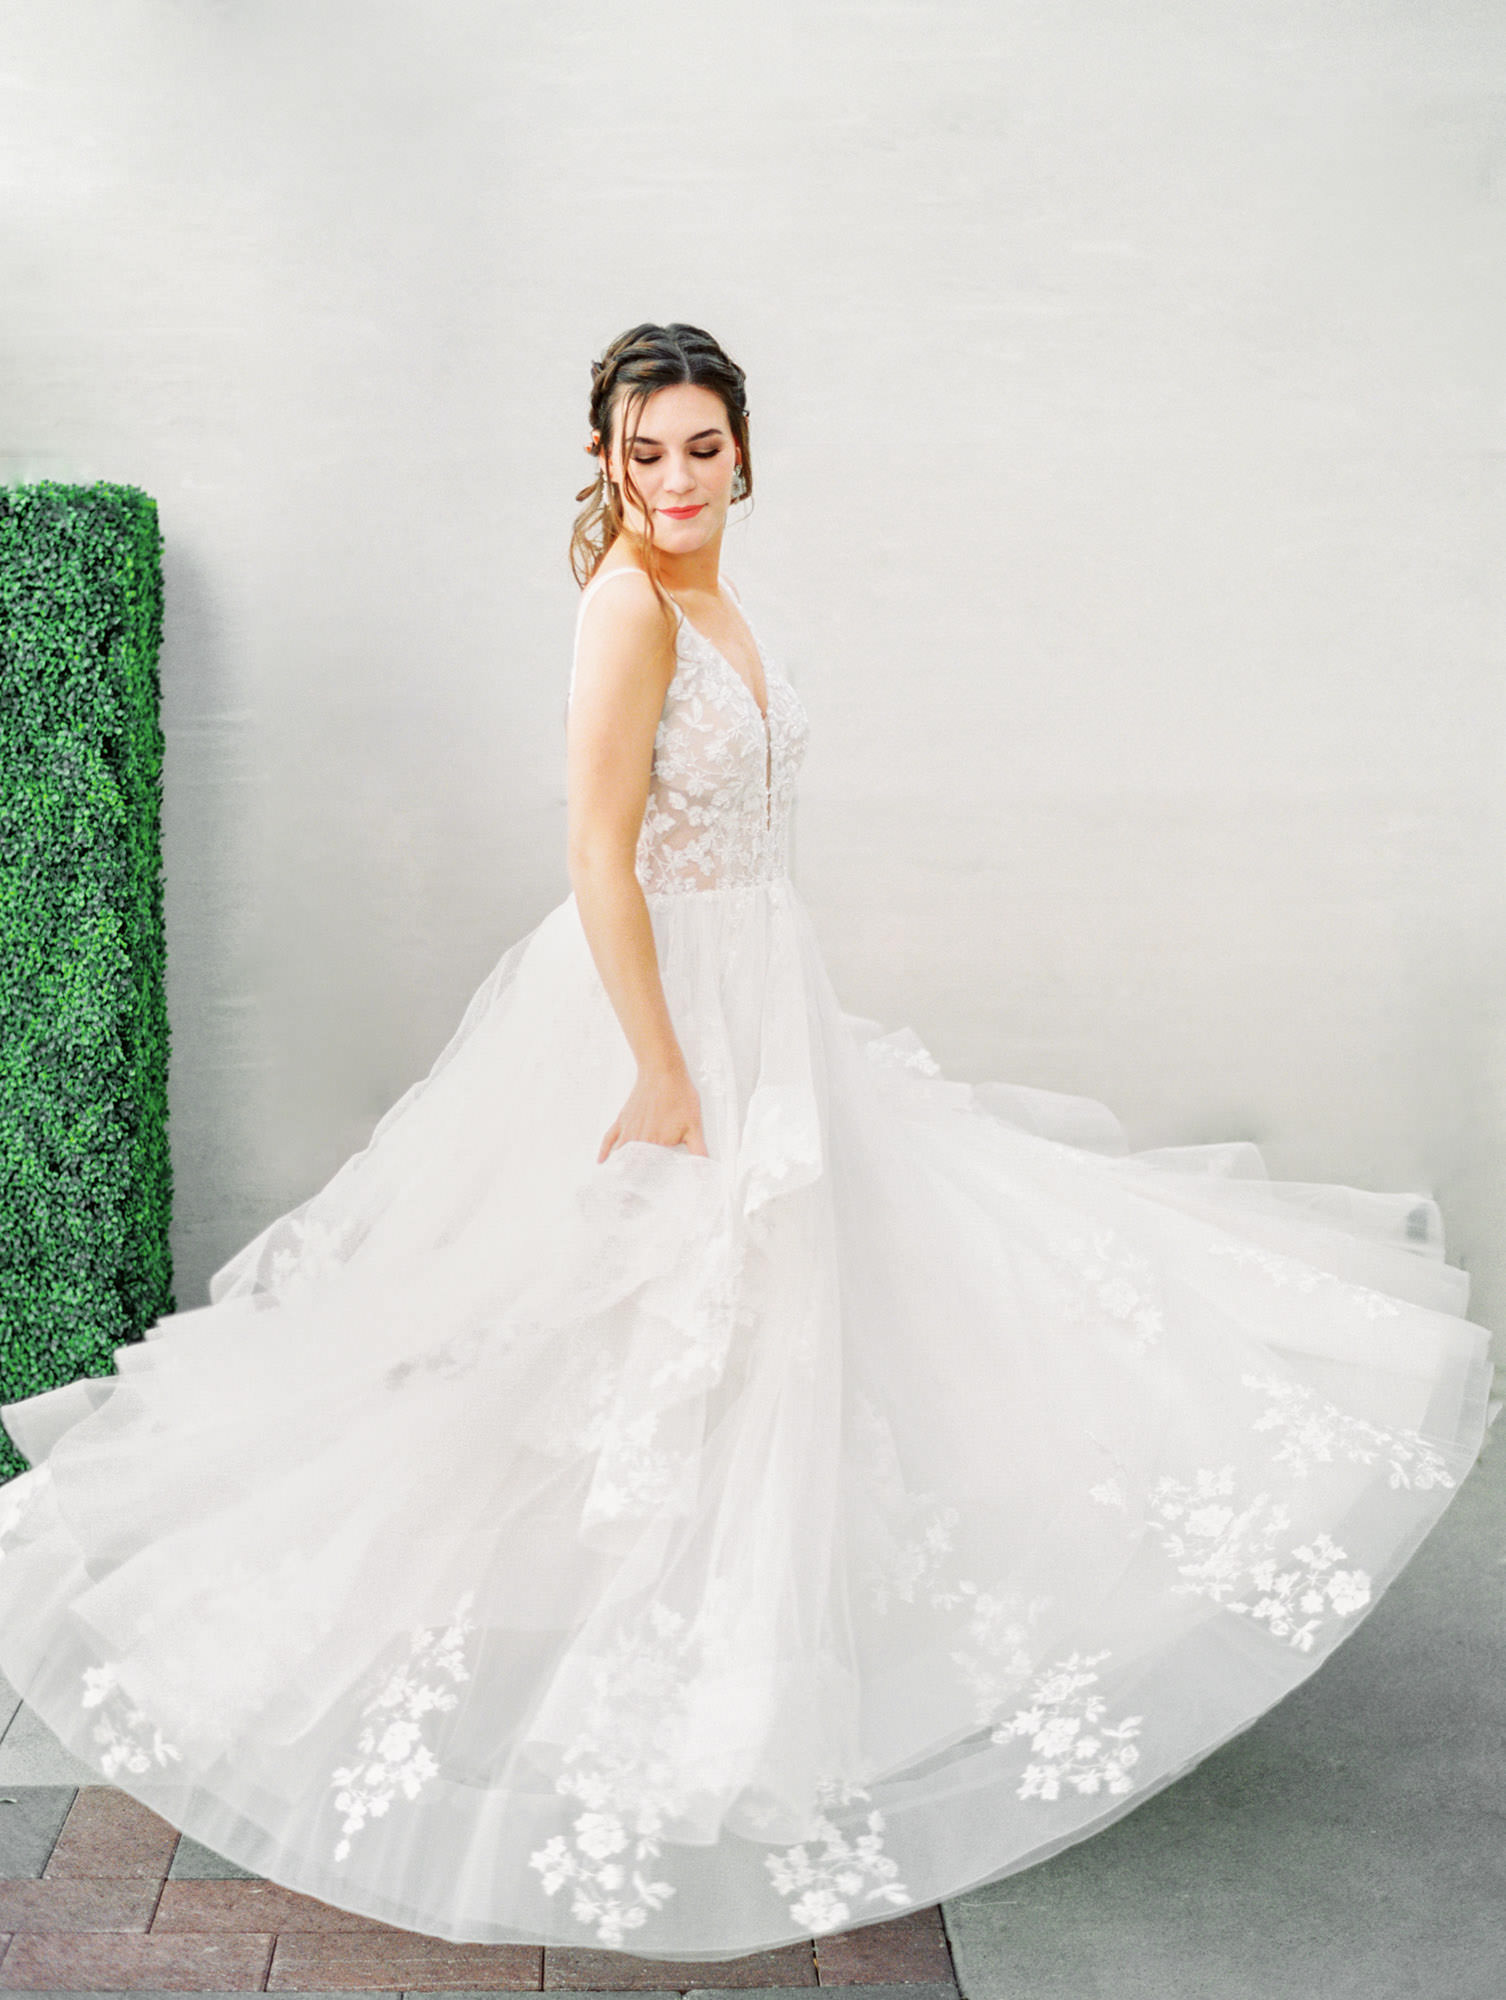 1105 sleeveless ballgown with floral lace Martina Liana wedding dress in San Diego by Cavin Elizabeth - San Diego film photographer